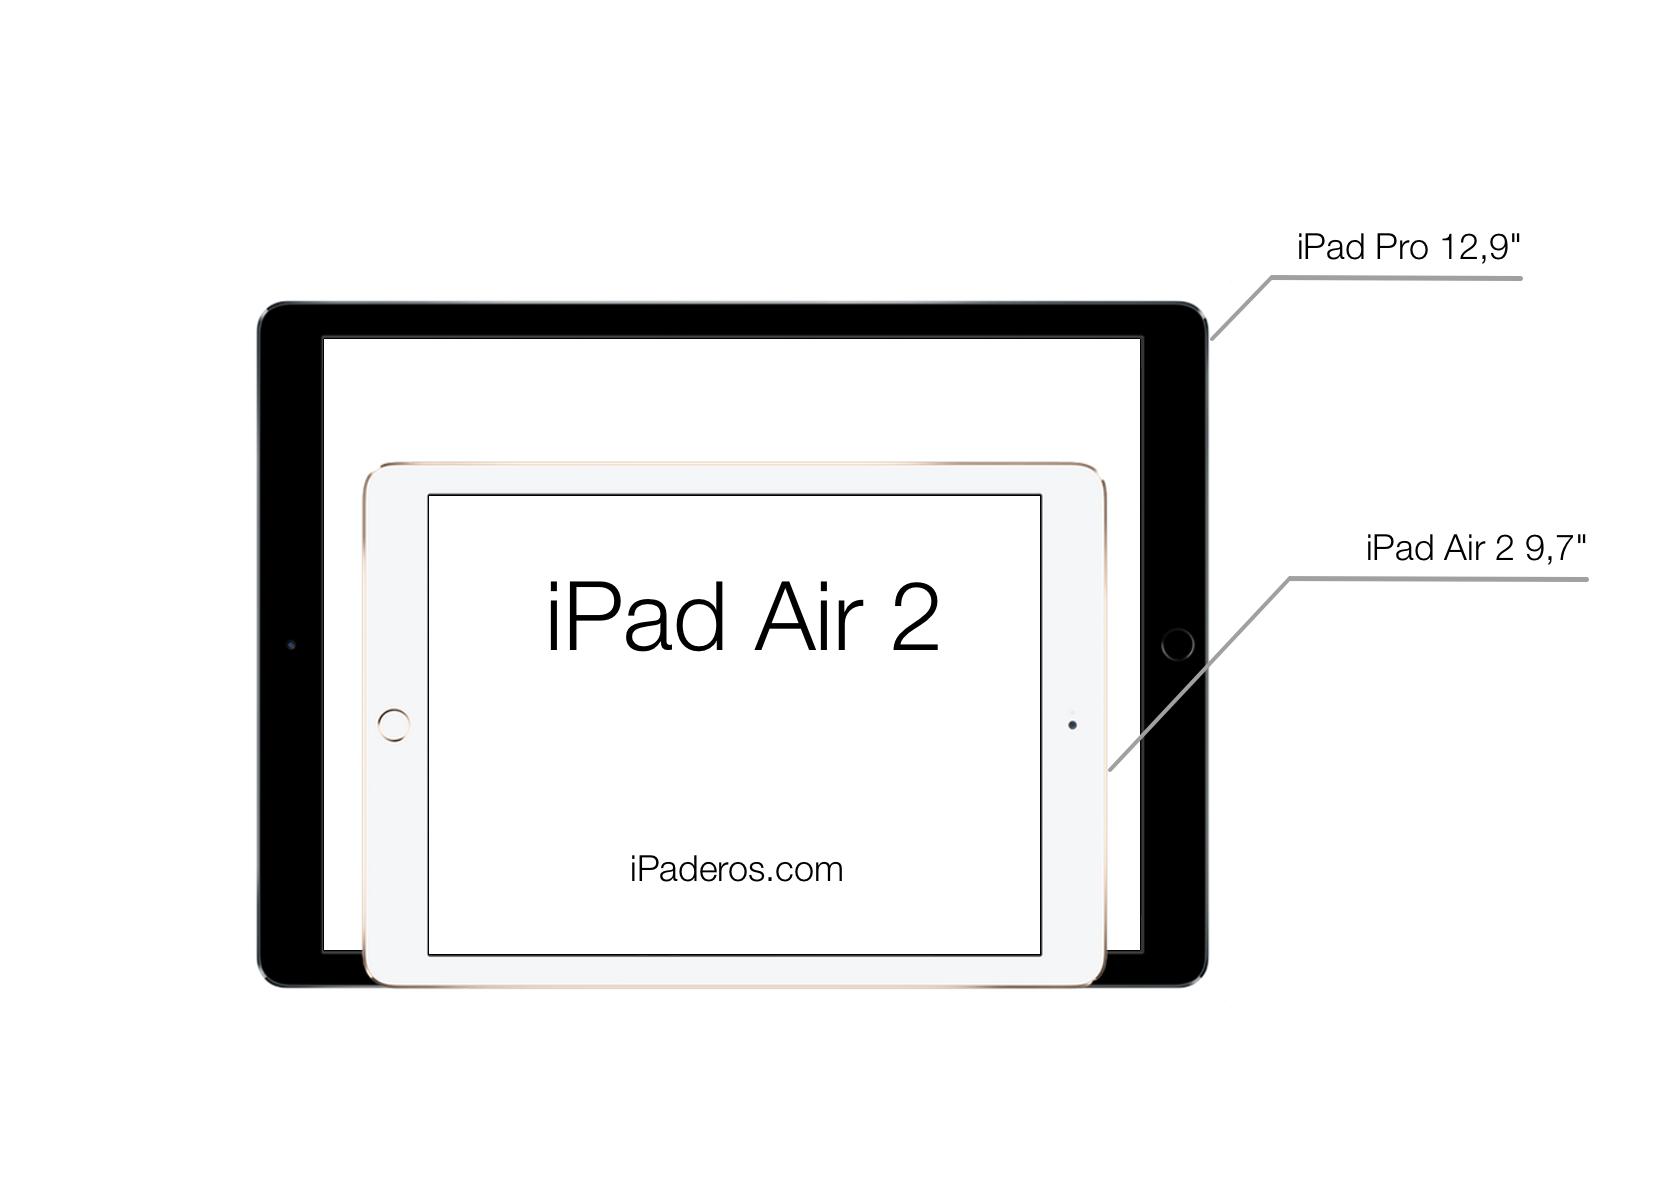 iPad Pro vs iPad Air 2 thickness comparison